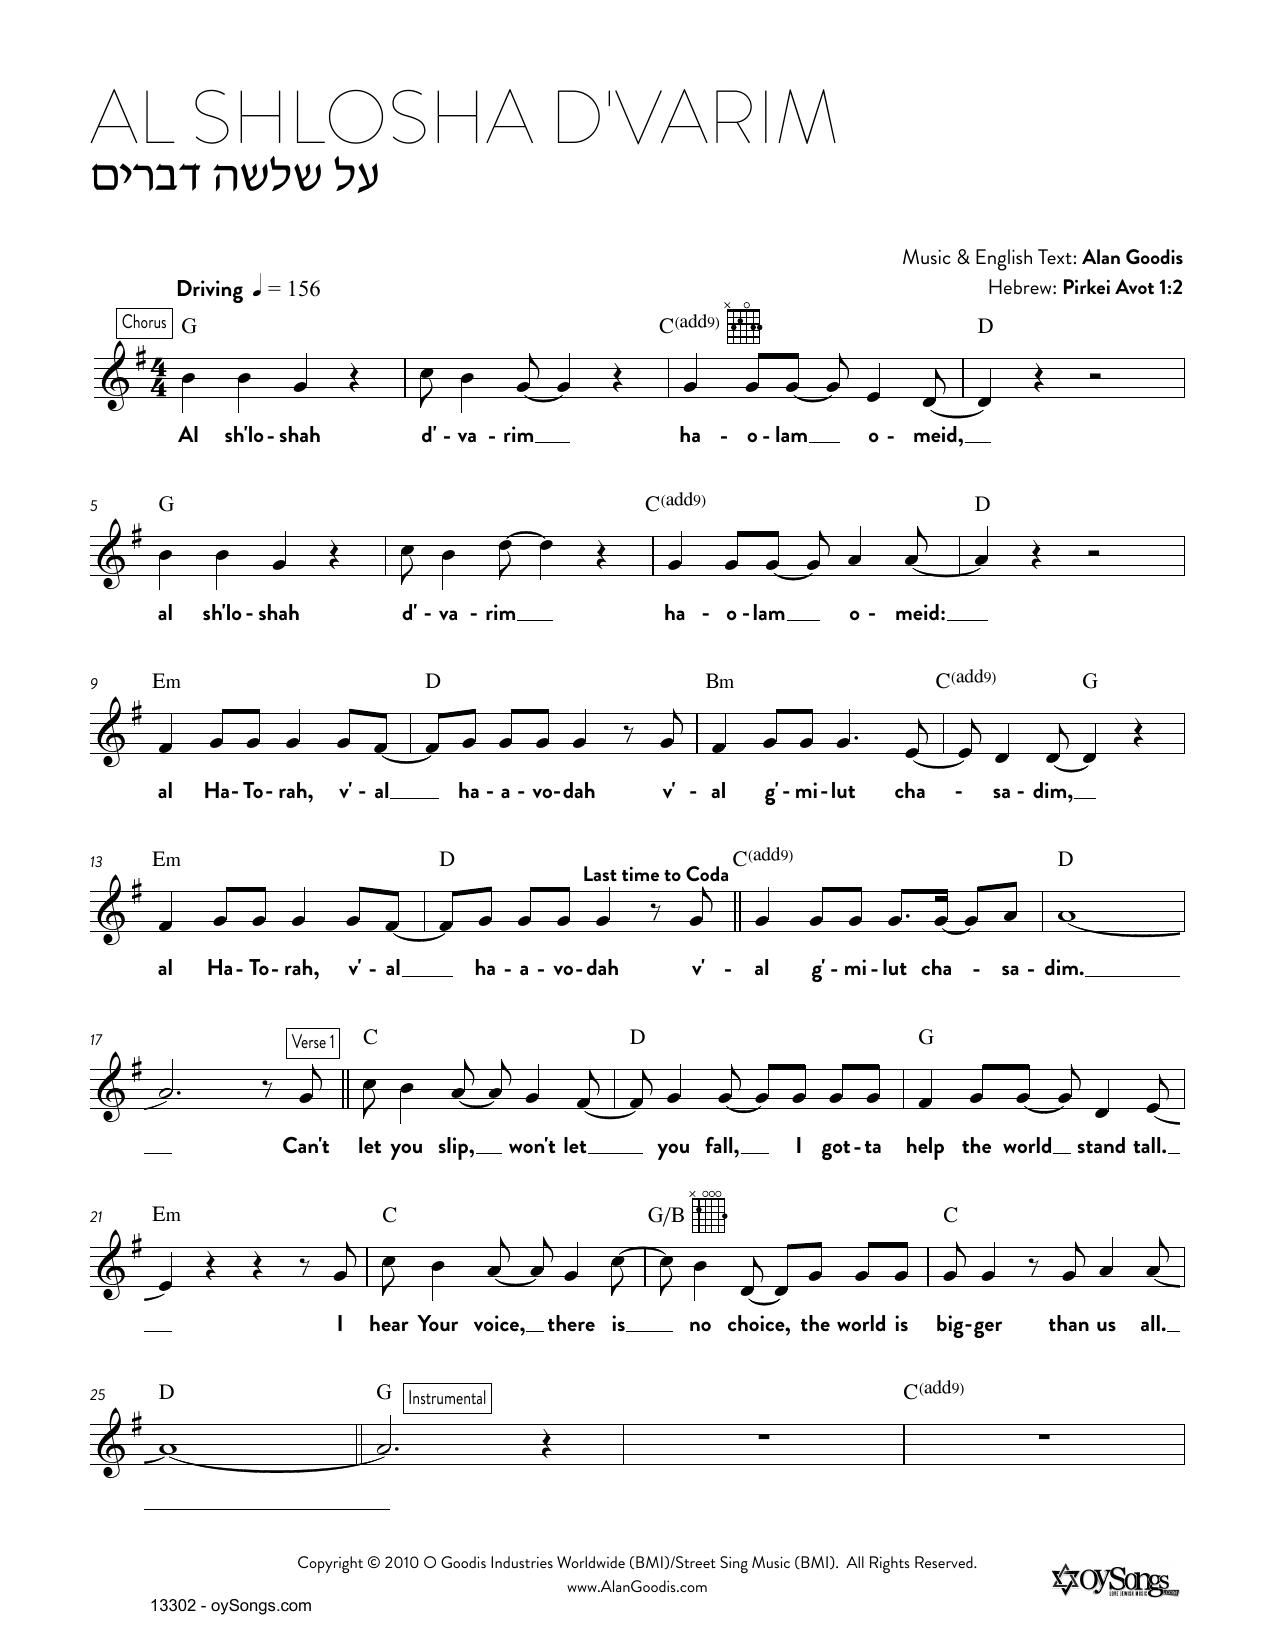 Alan Goodis Al Shlosha D'varim sheet music notes and chords. Download Printable PDF.